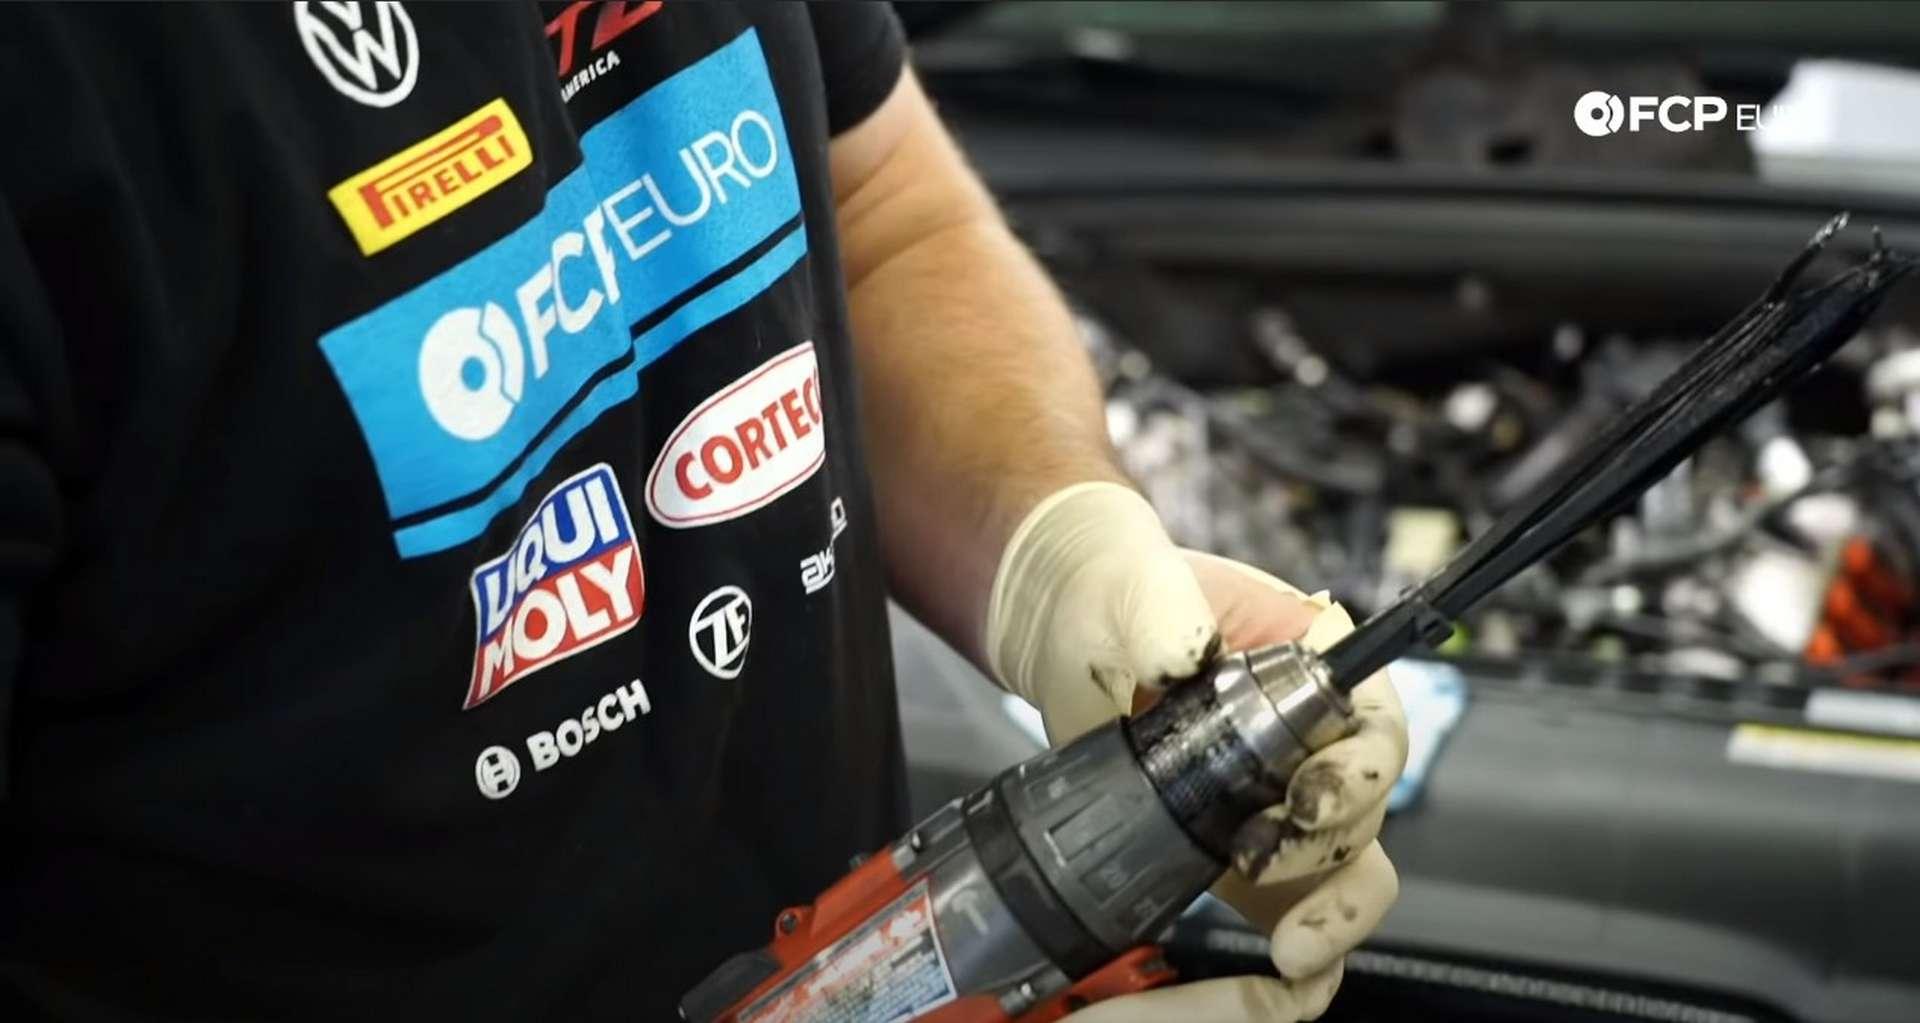 DIY Audi 3.0t Walnut Blasting Intake Valves Audi TSB zip tie tool